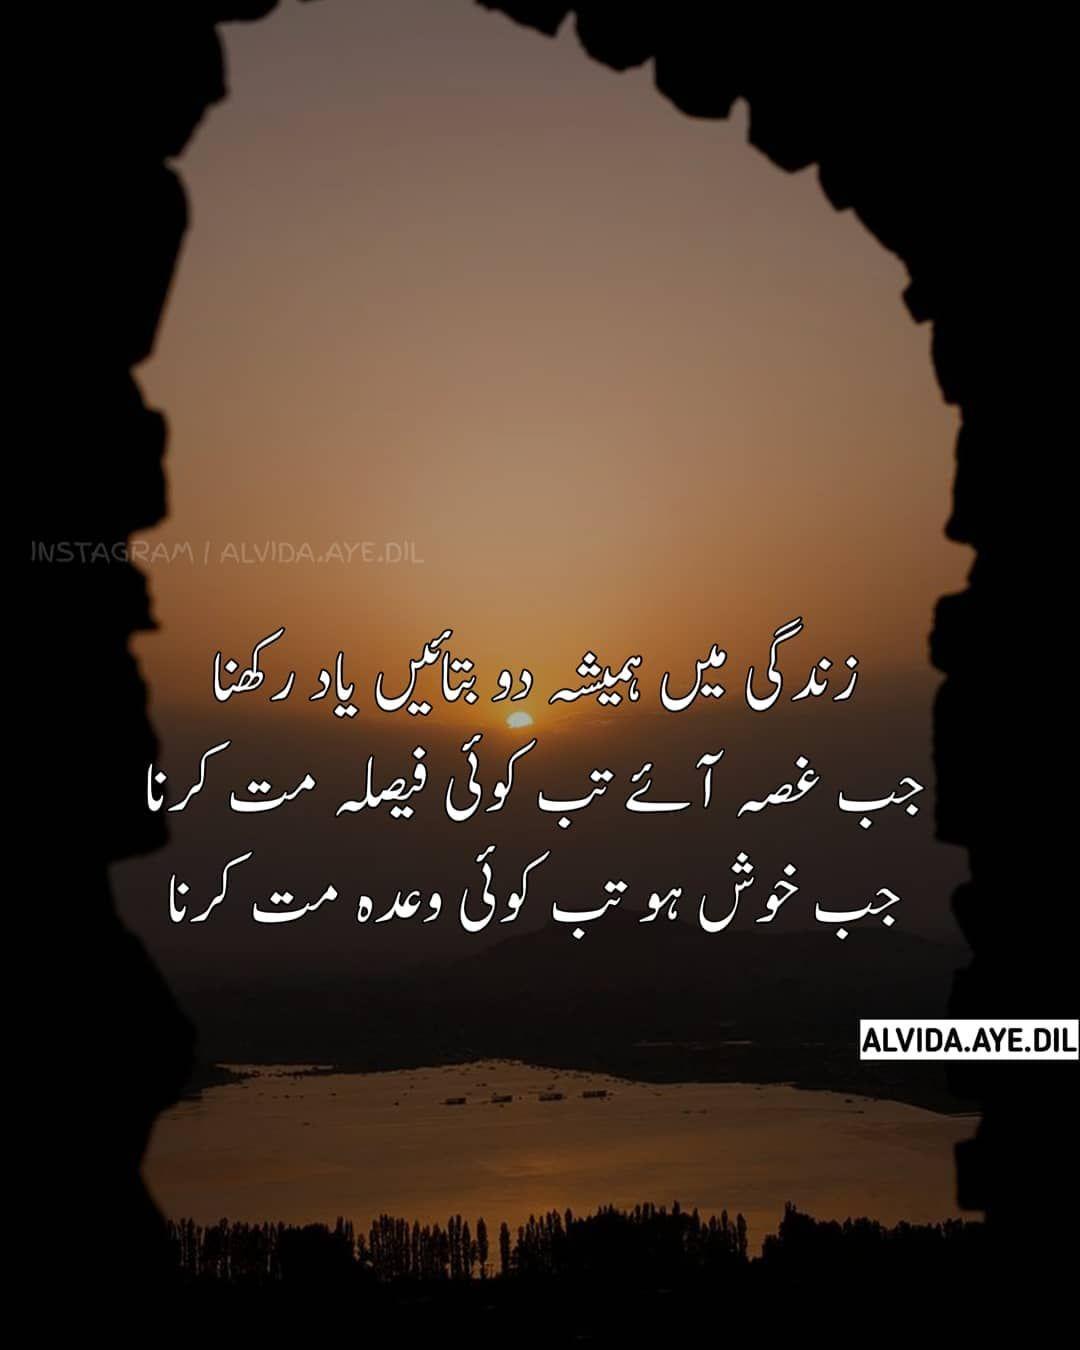 Zindagi Me Hamesha Do Batain Yaad Rakhna Jab Gussa Aye Tab Koi Faisla Mat Karna Jab Khush Ho Tab Inspirational Quotes About Success Islamic Quotes Urdu Quotes